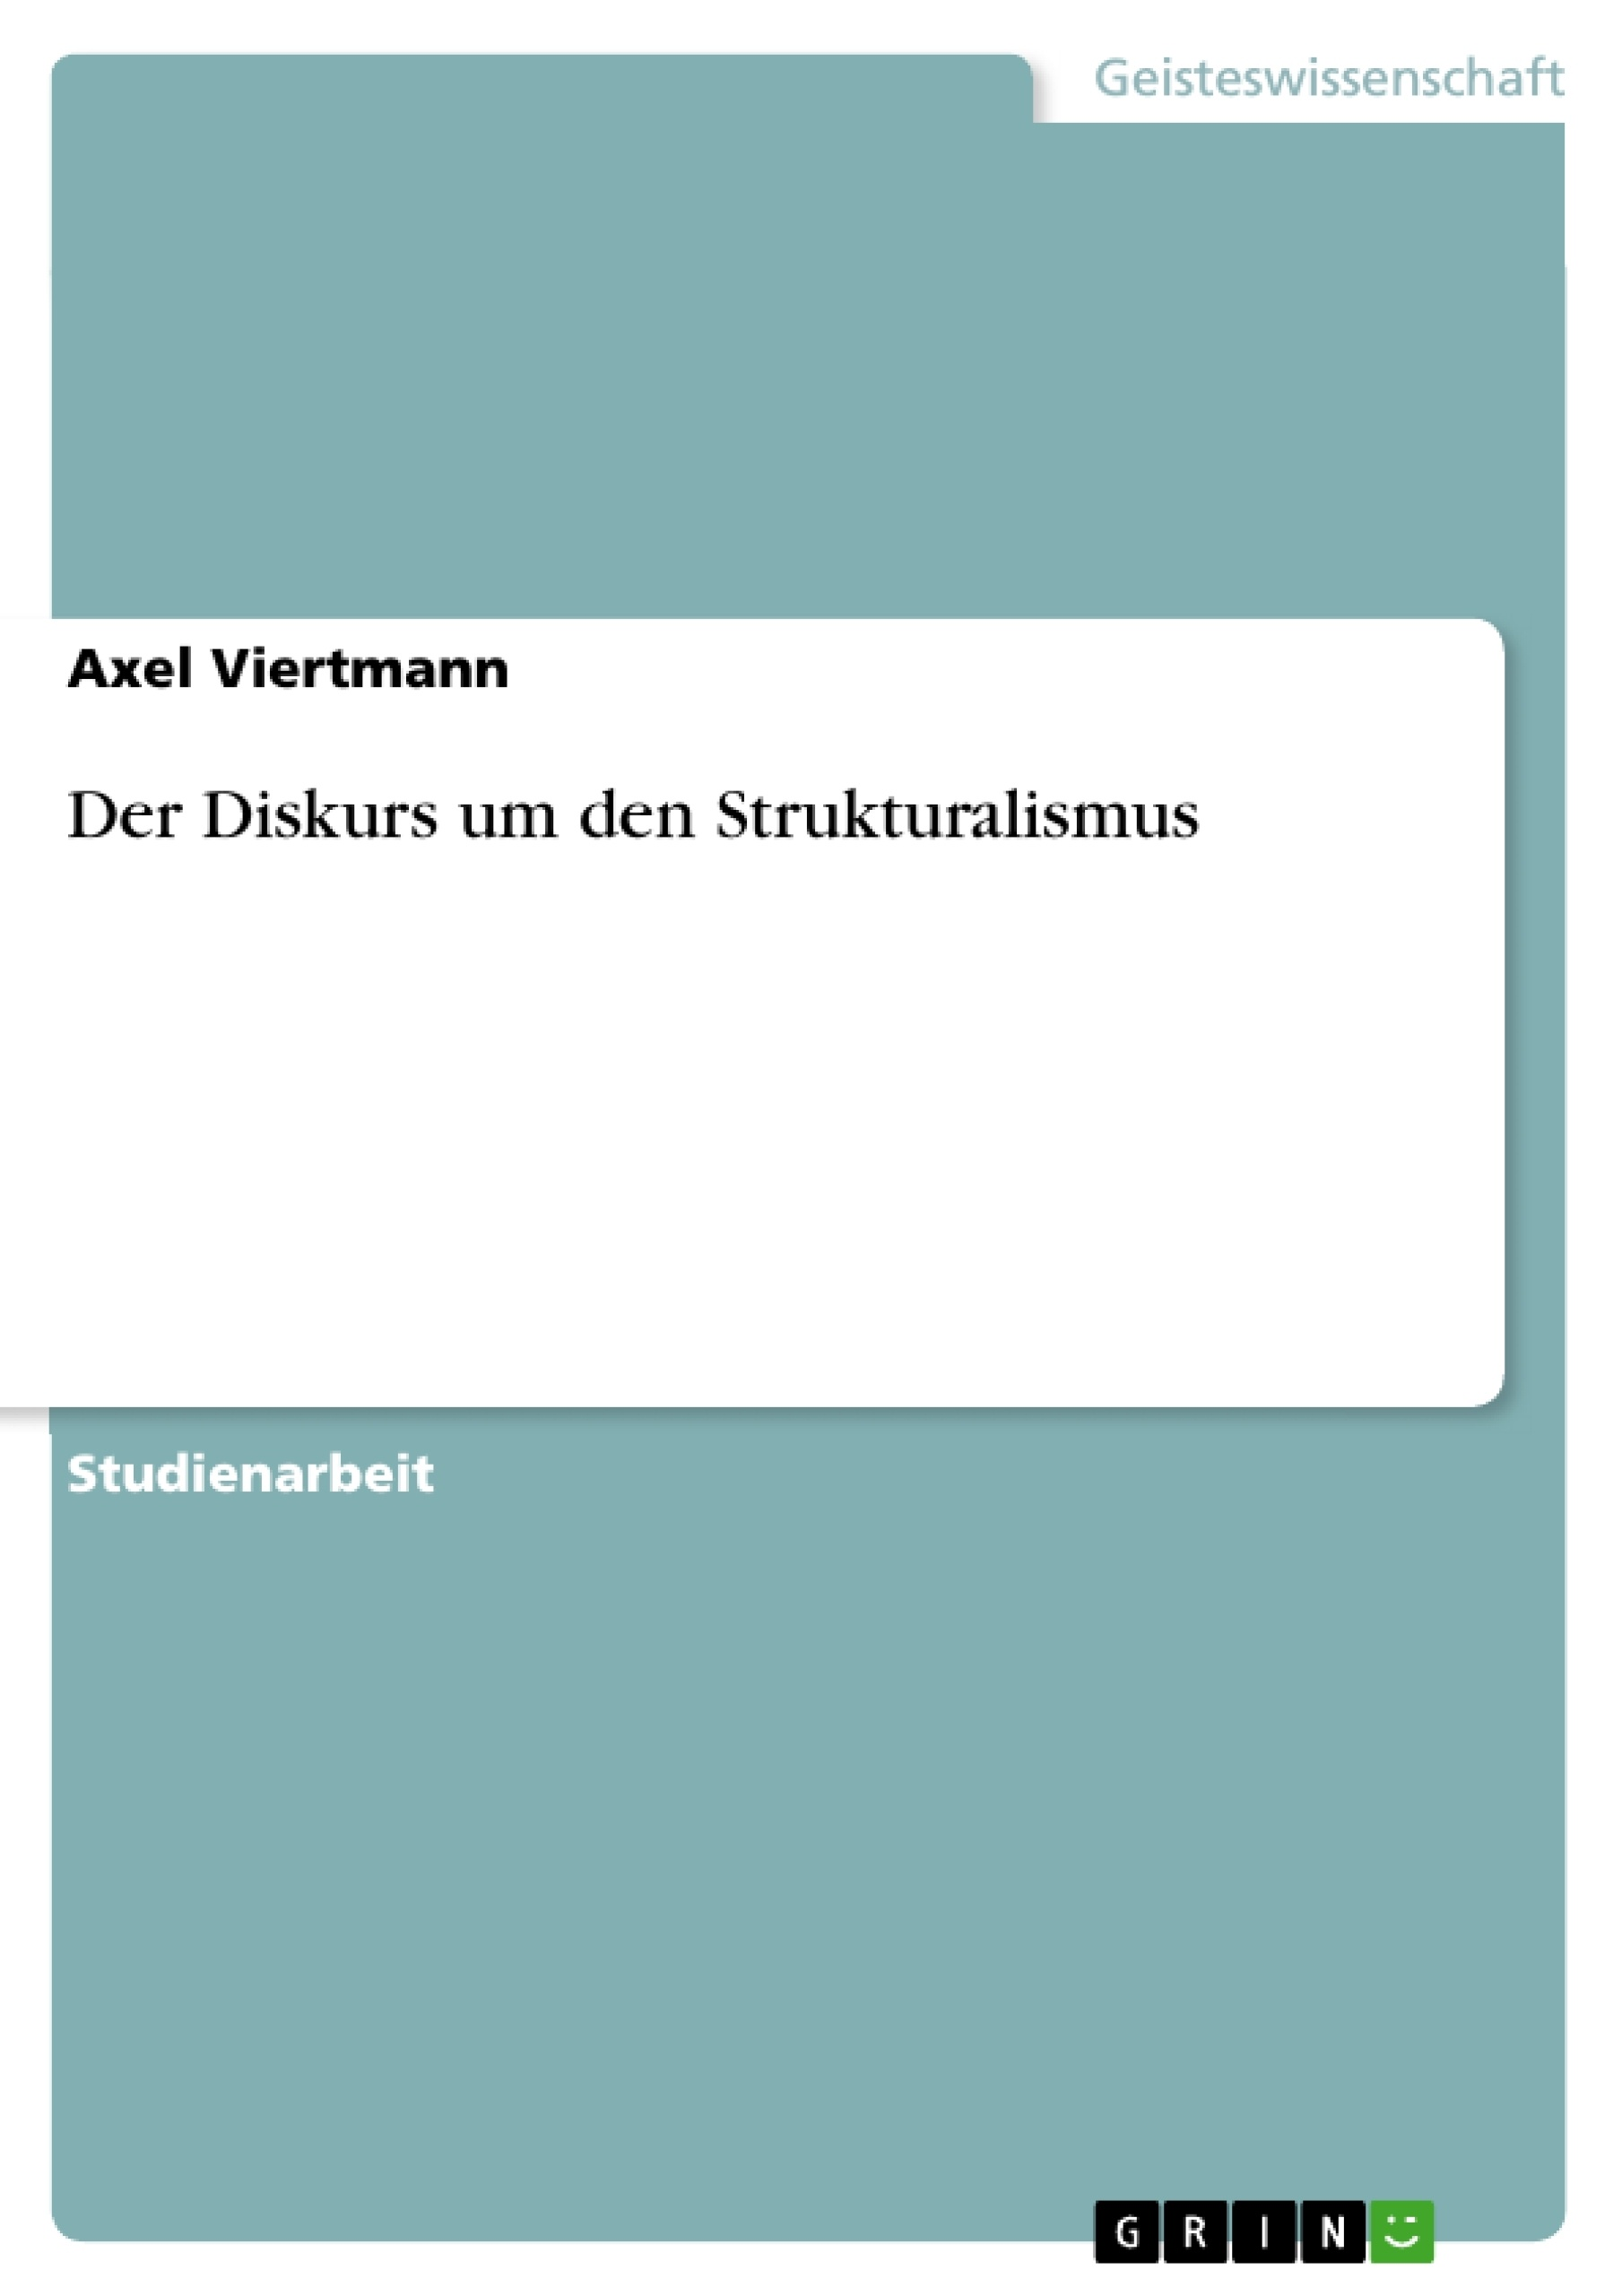 Titel: Der Diskurs um den Strukturalismus